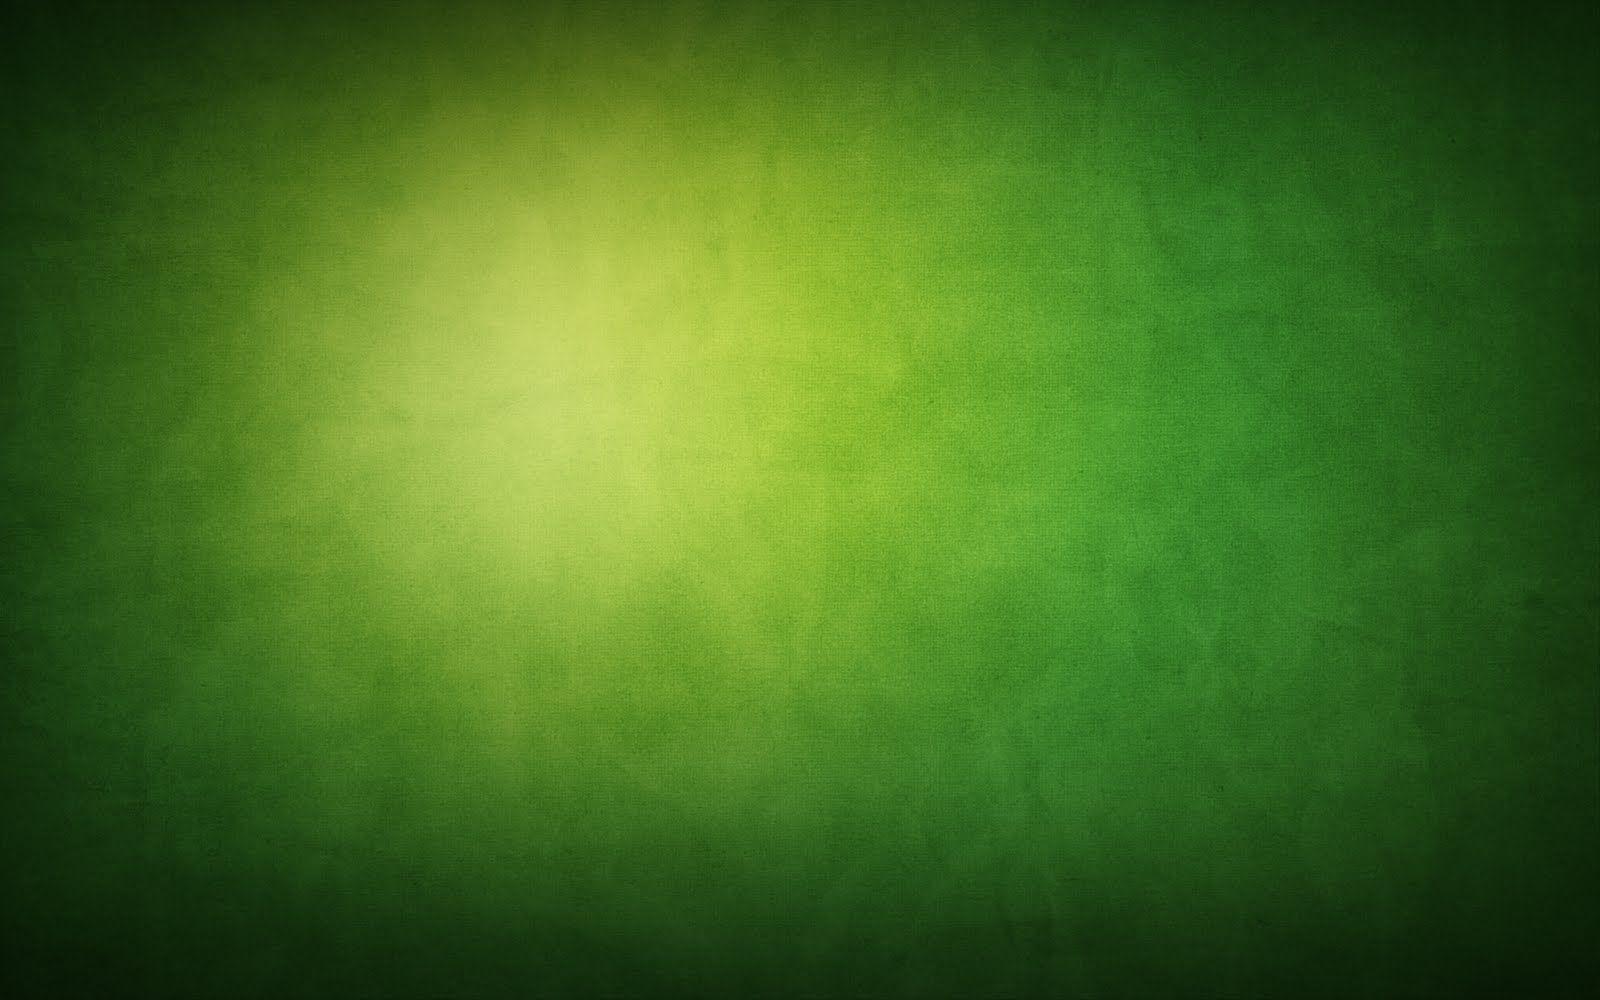 Texture green wall desktop wallpaper download texture for Green wallpaper for walls